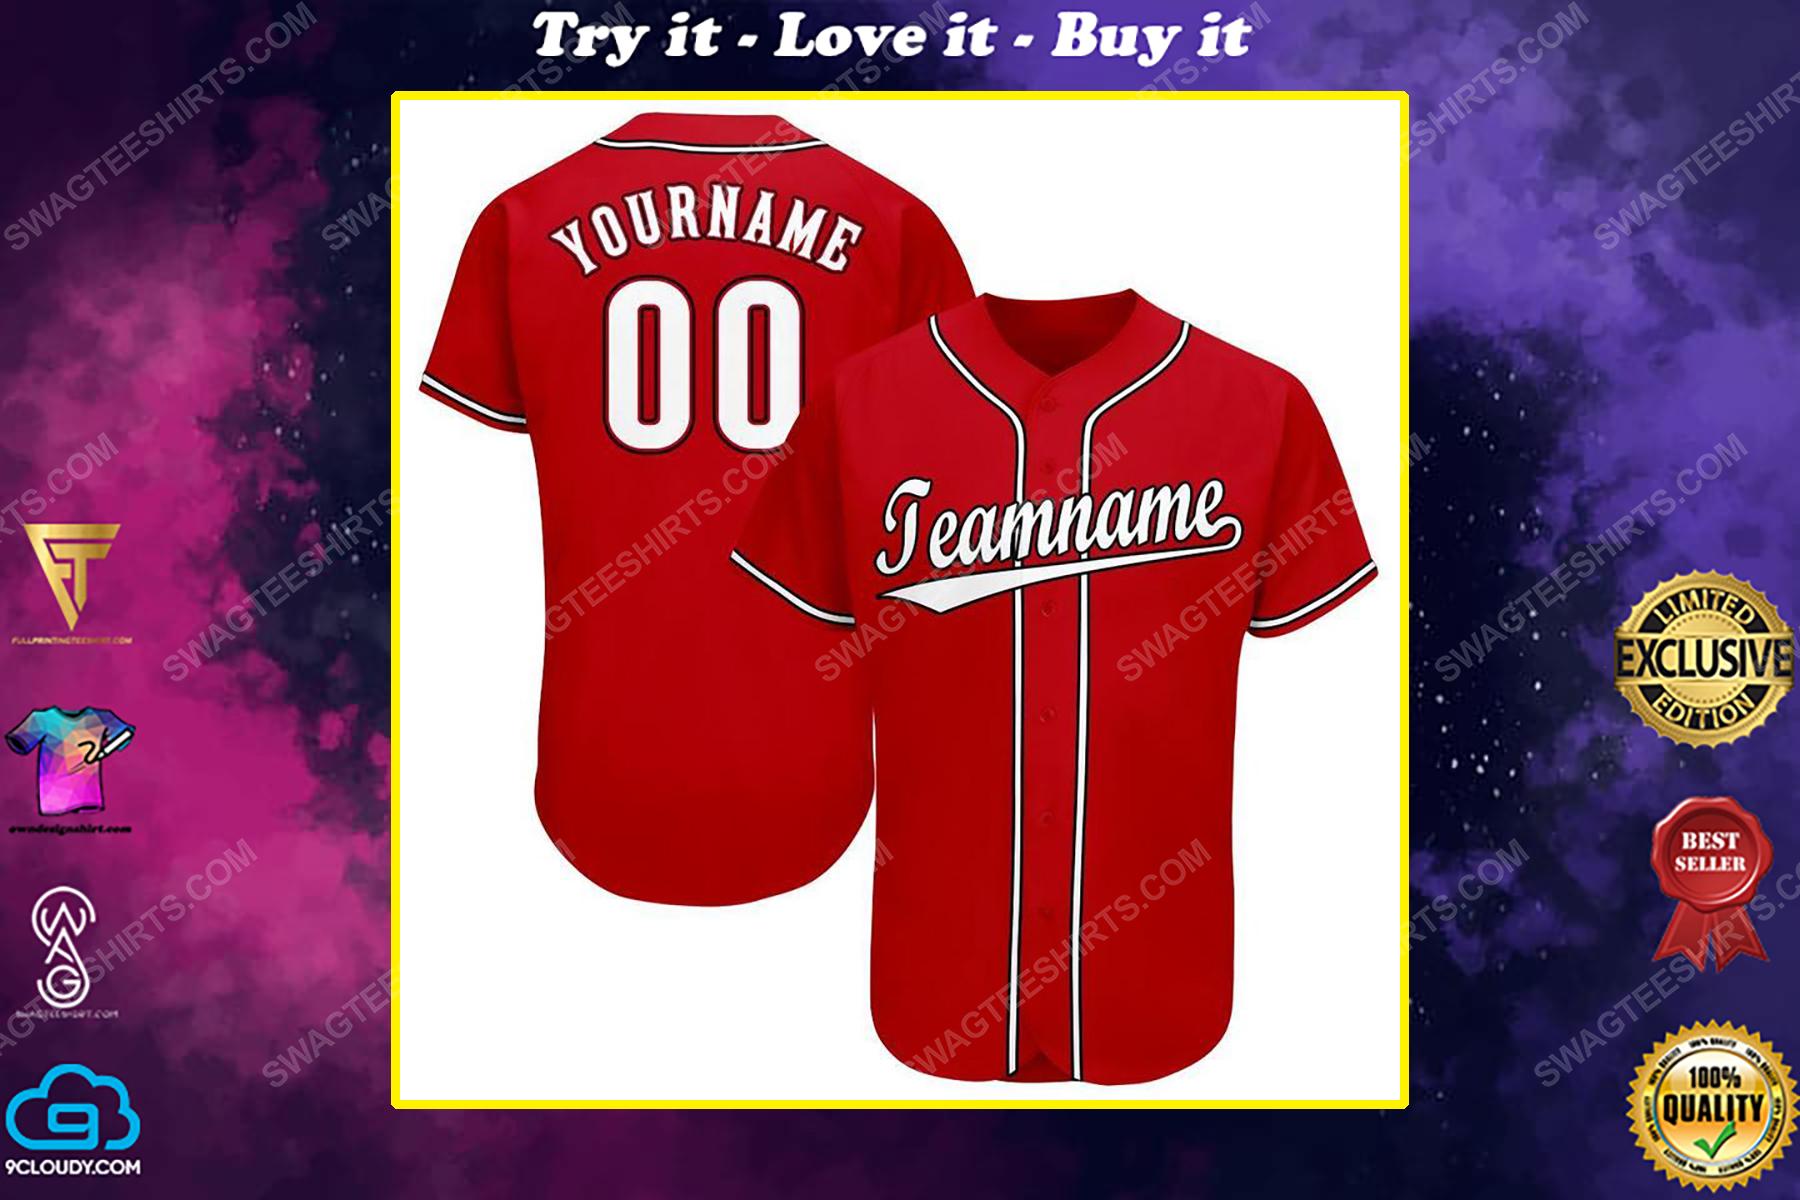 Custom team name Cincinnati Reds baseball jersey